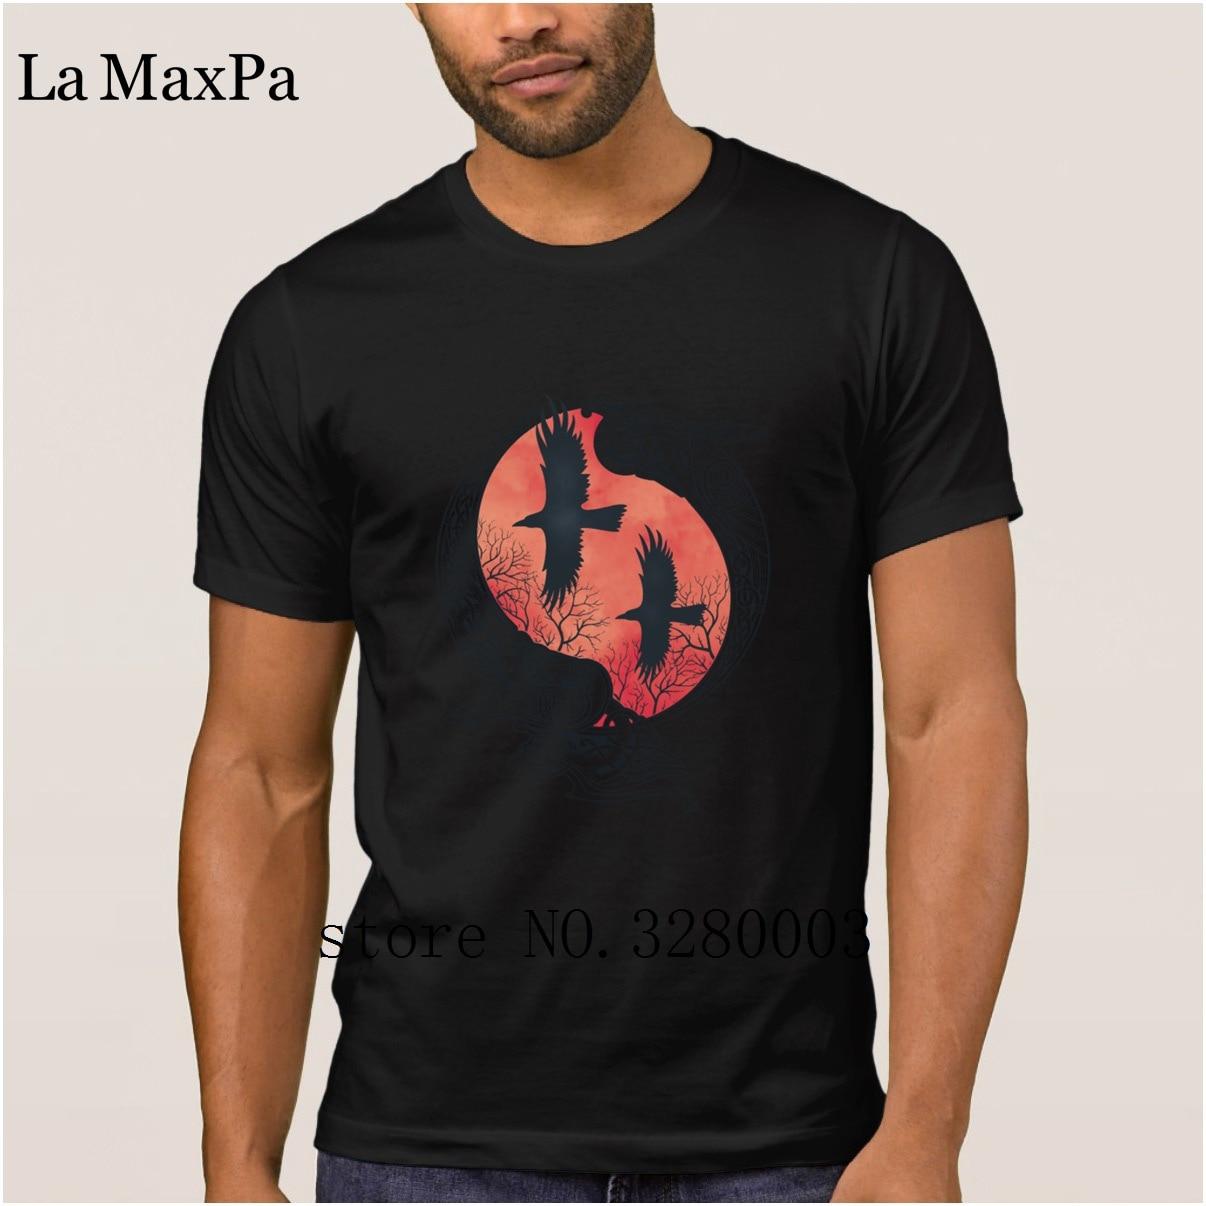 La Maxpa printed Humor men t shirt hugin munin Odin crow t-shirt man Spring  Autumn Letter tshirt for